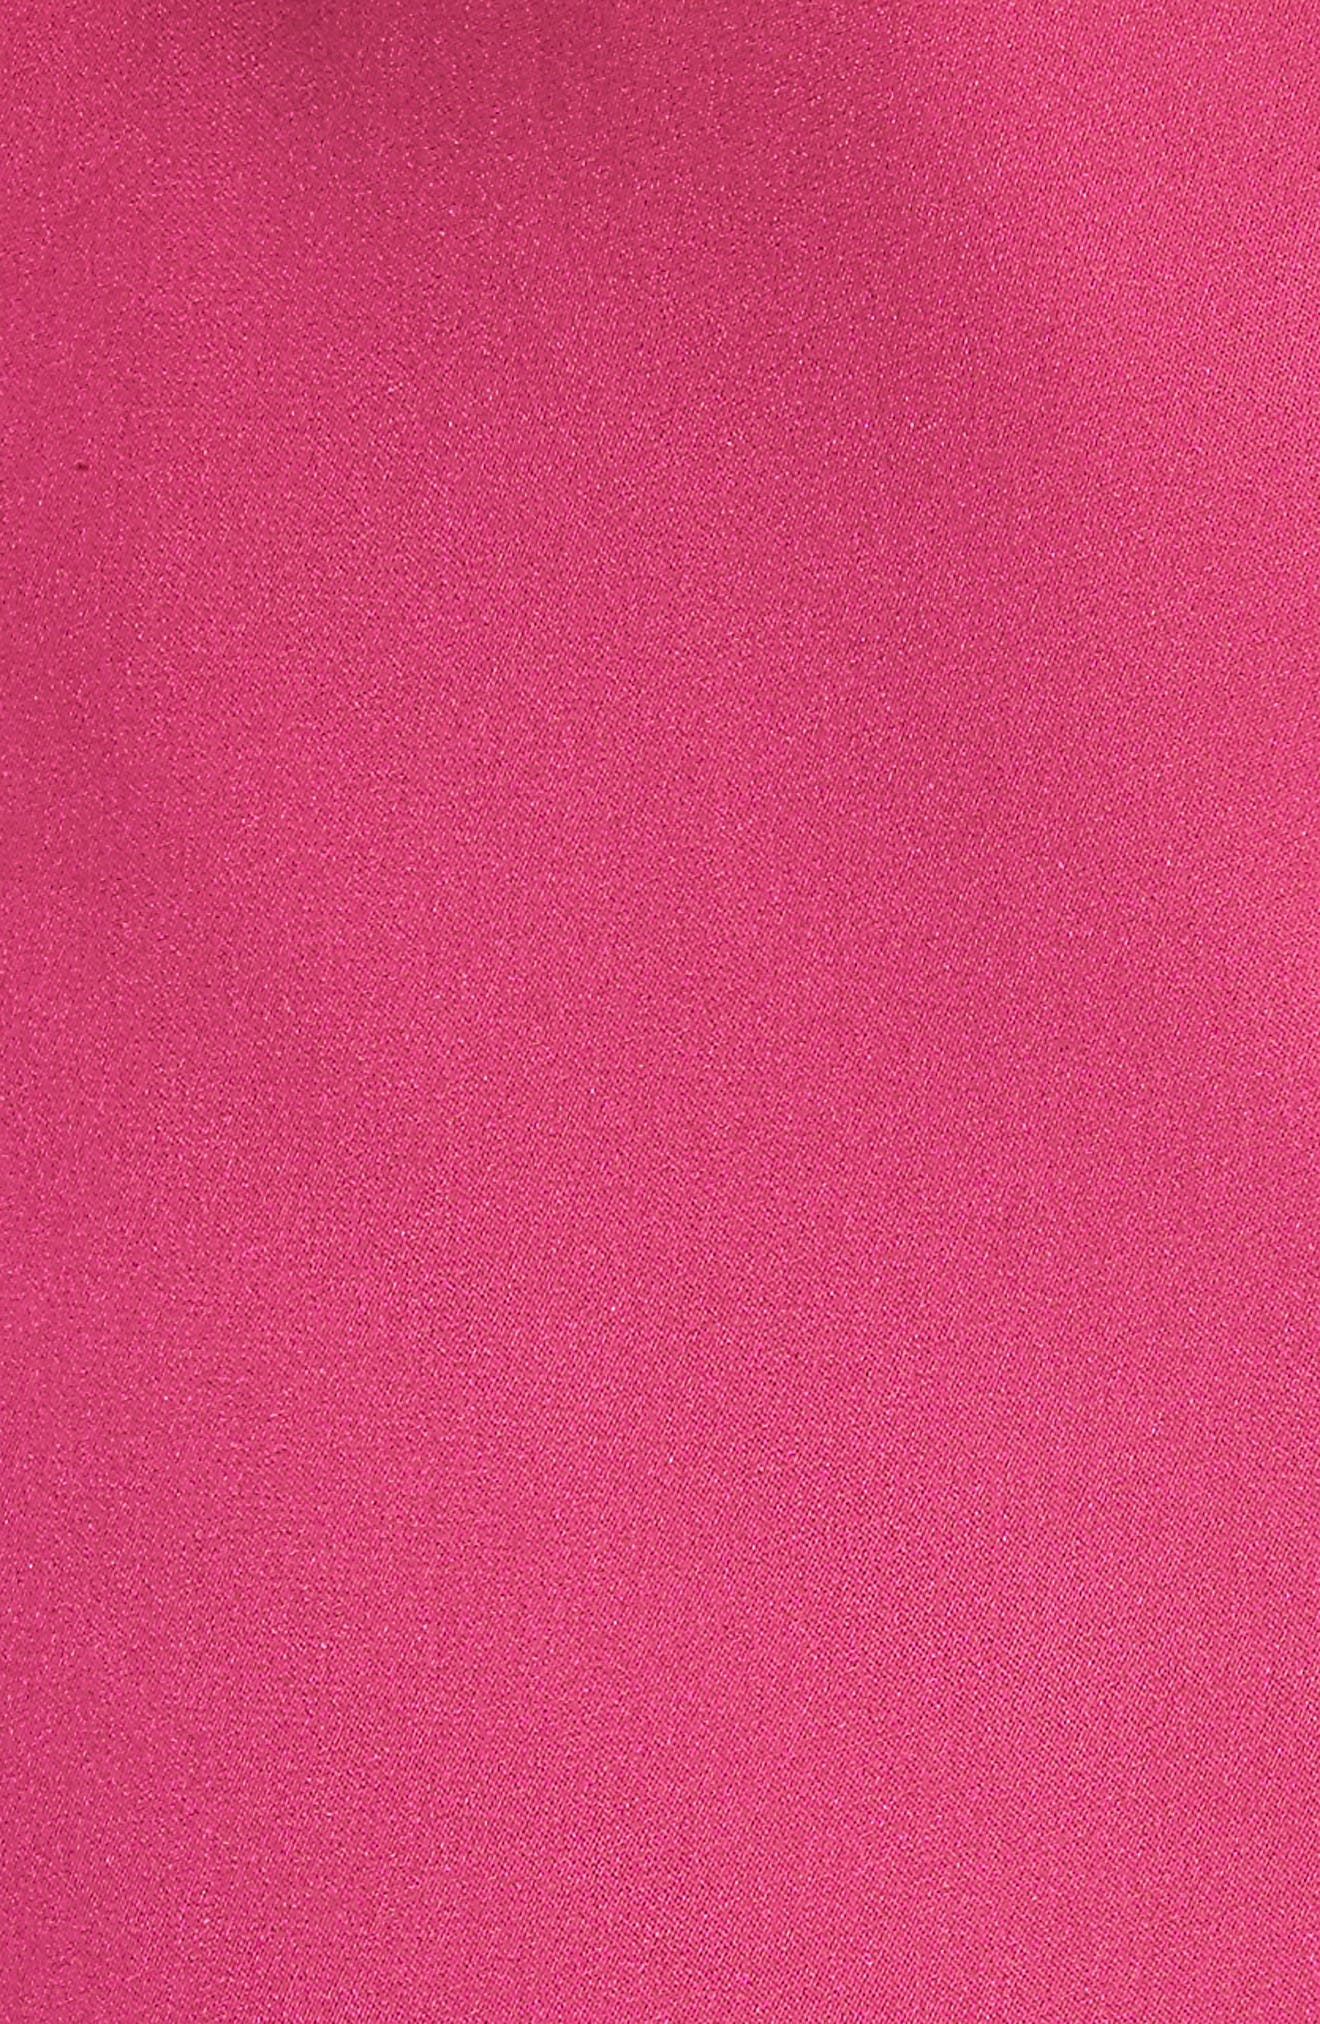 Luna Lace Trim Stretch Silk Slipdress,                             Alternate thumbnail 5, color,                             650